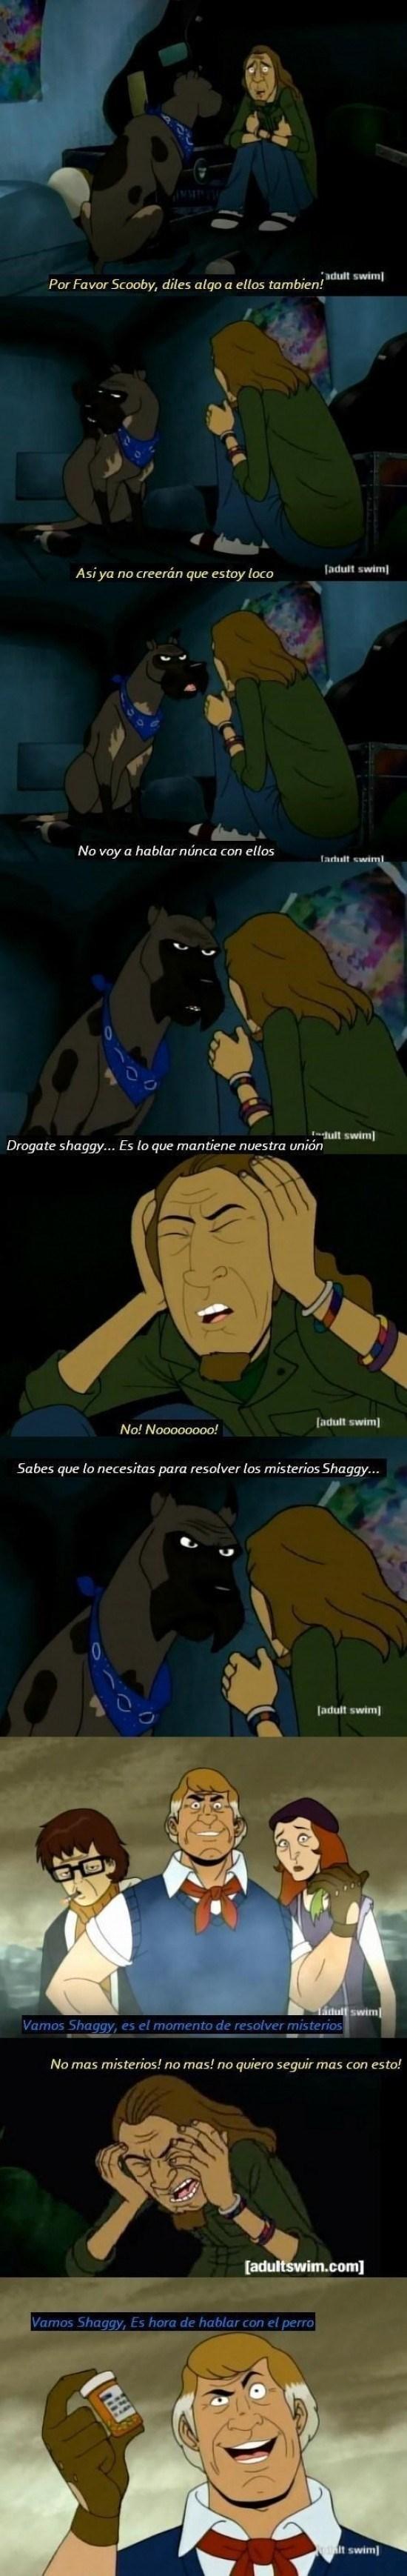 vineta perturbadora sobre el secreto de Scooby-Doo